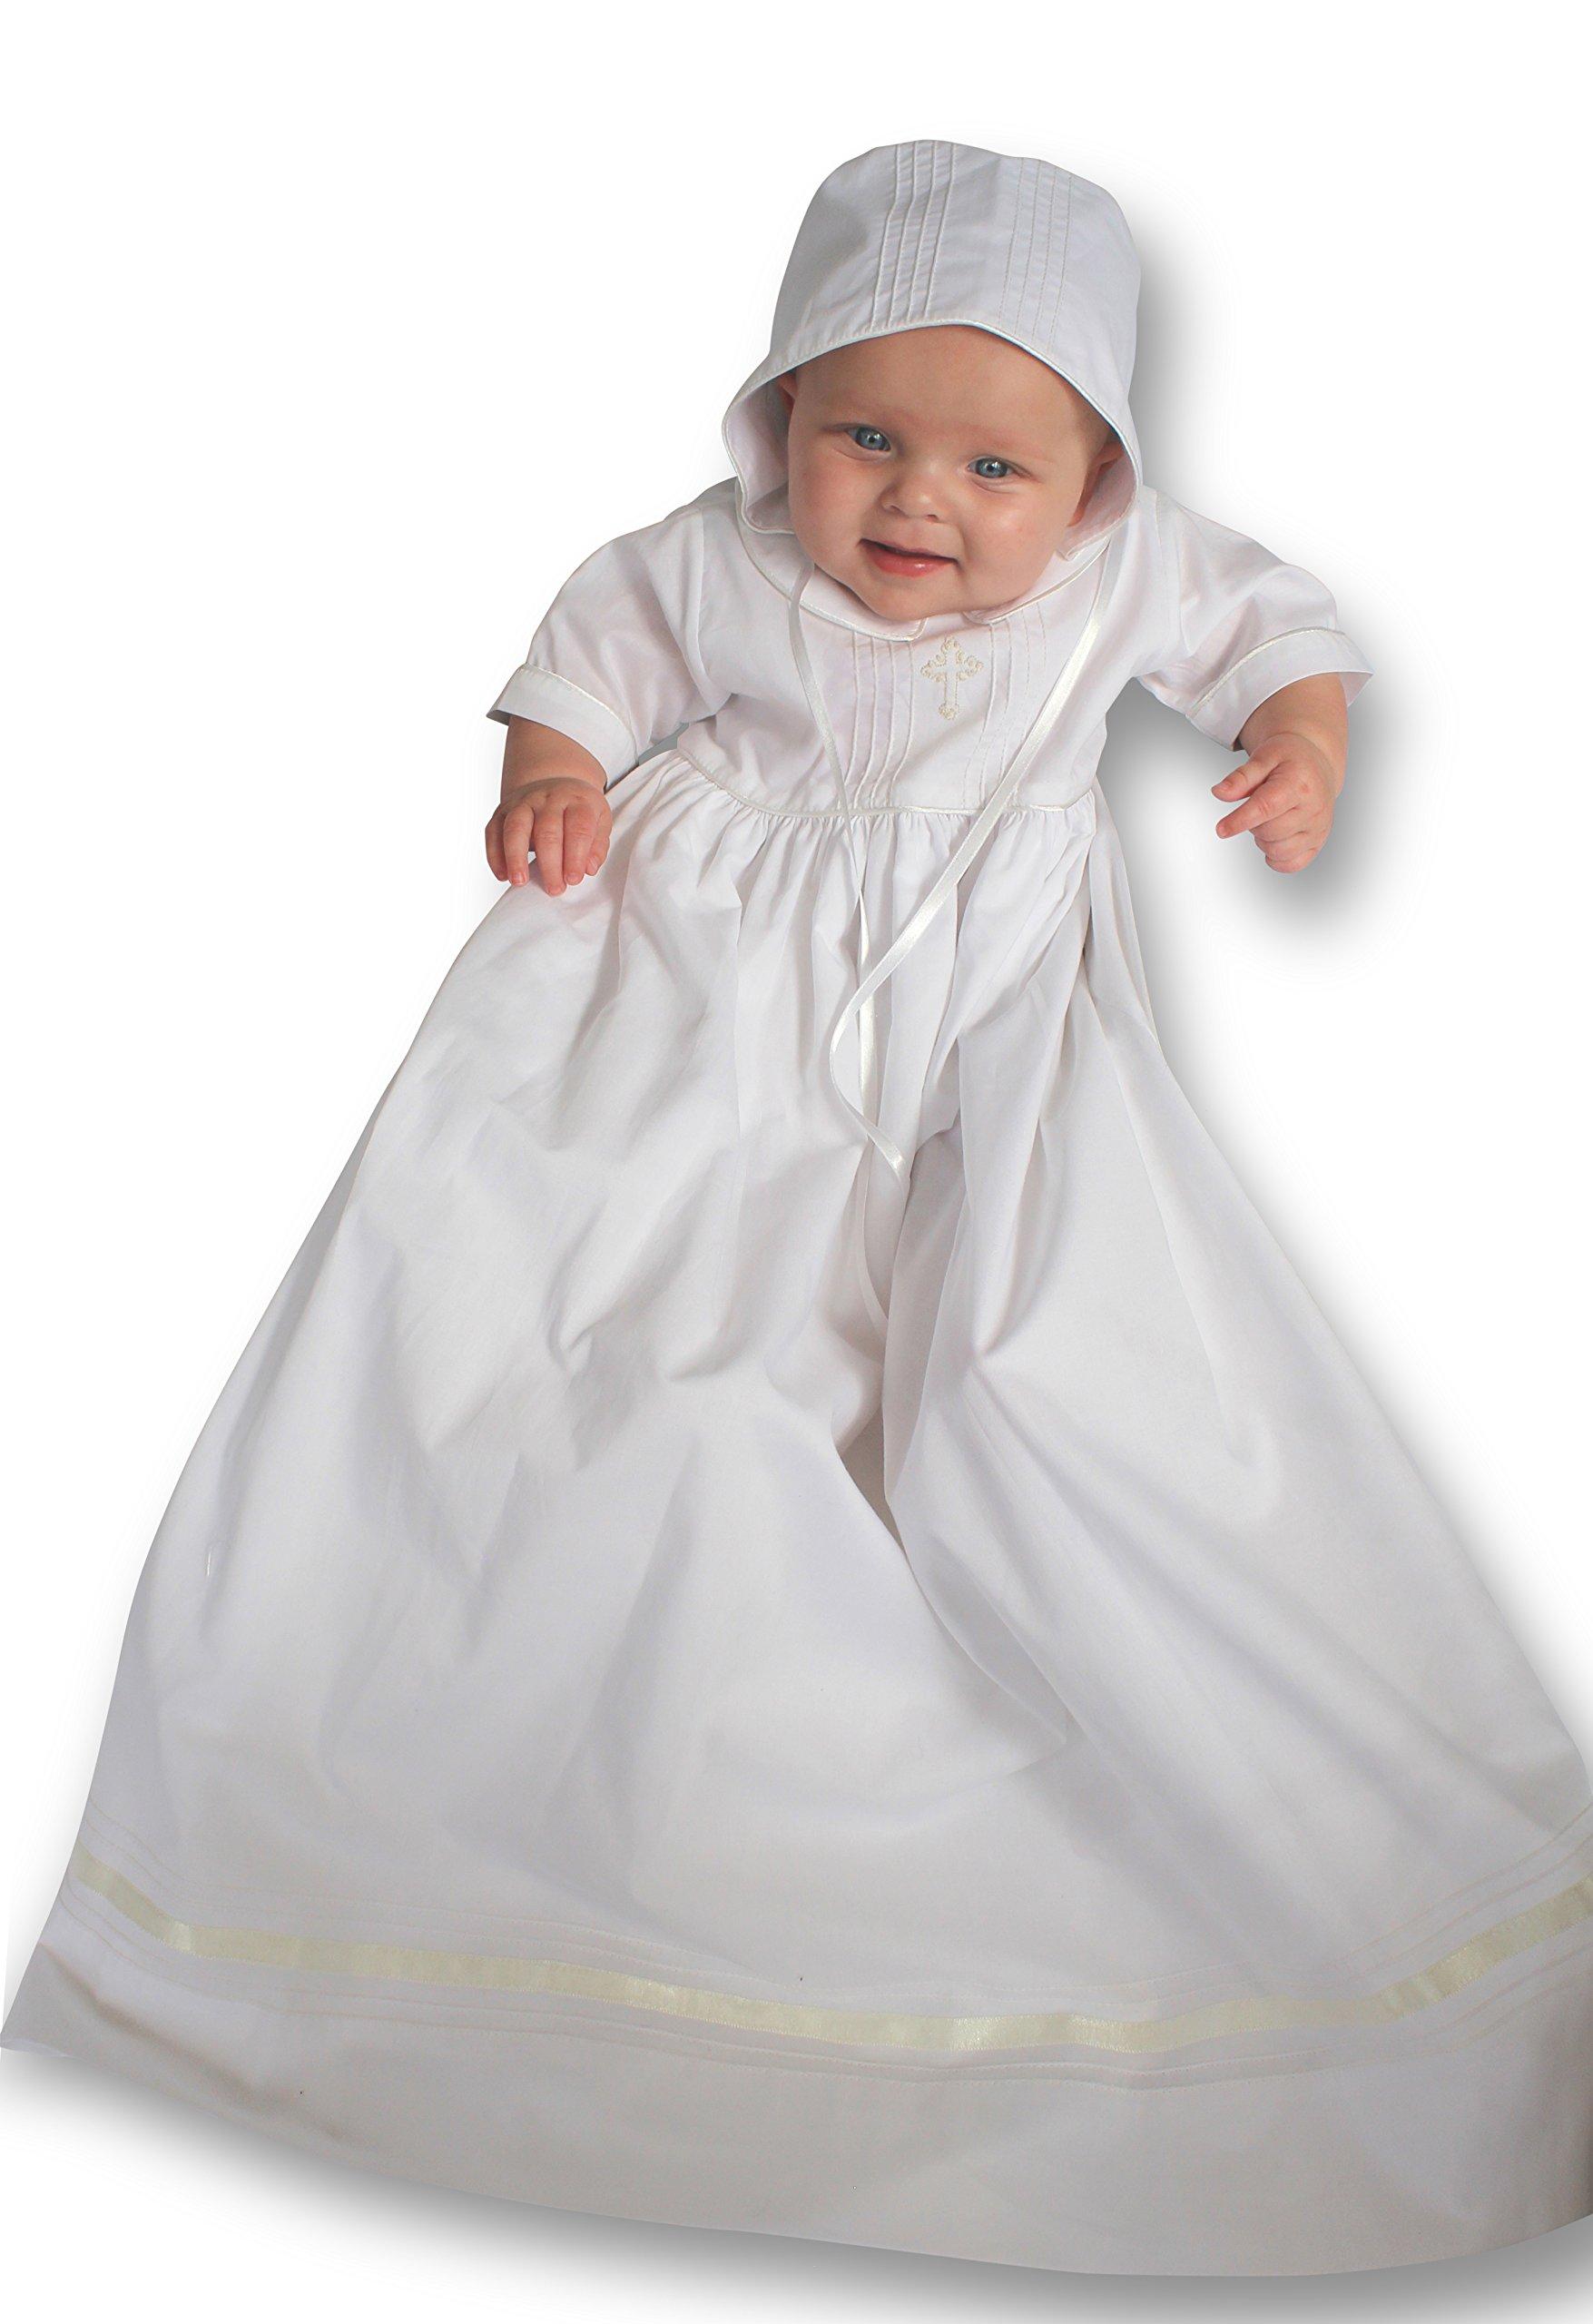 Strasburg Children Babies Alex Christening Gown Baptism Dress Infant White Cross (6 Month)